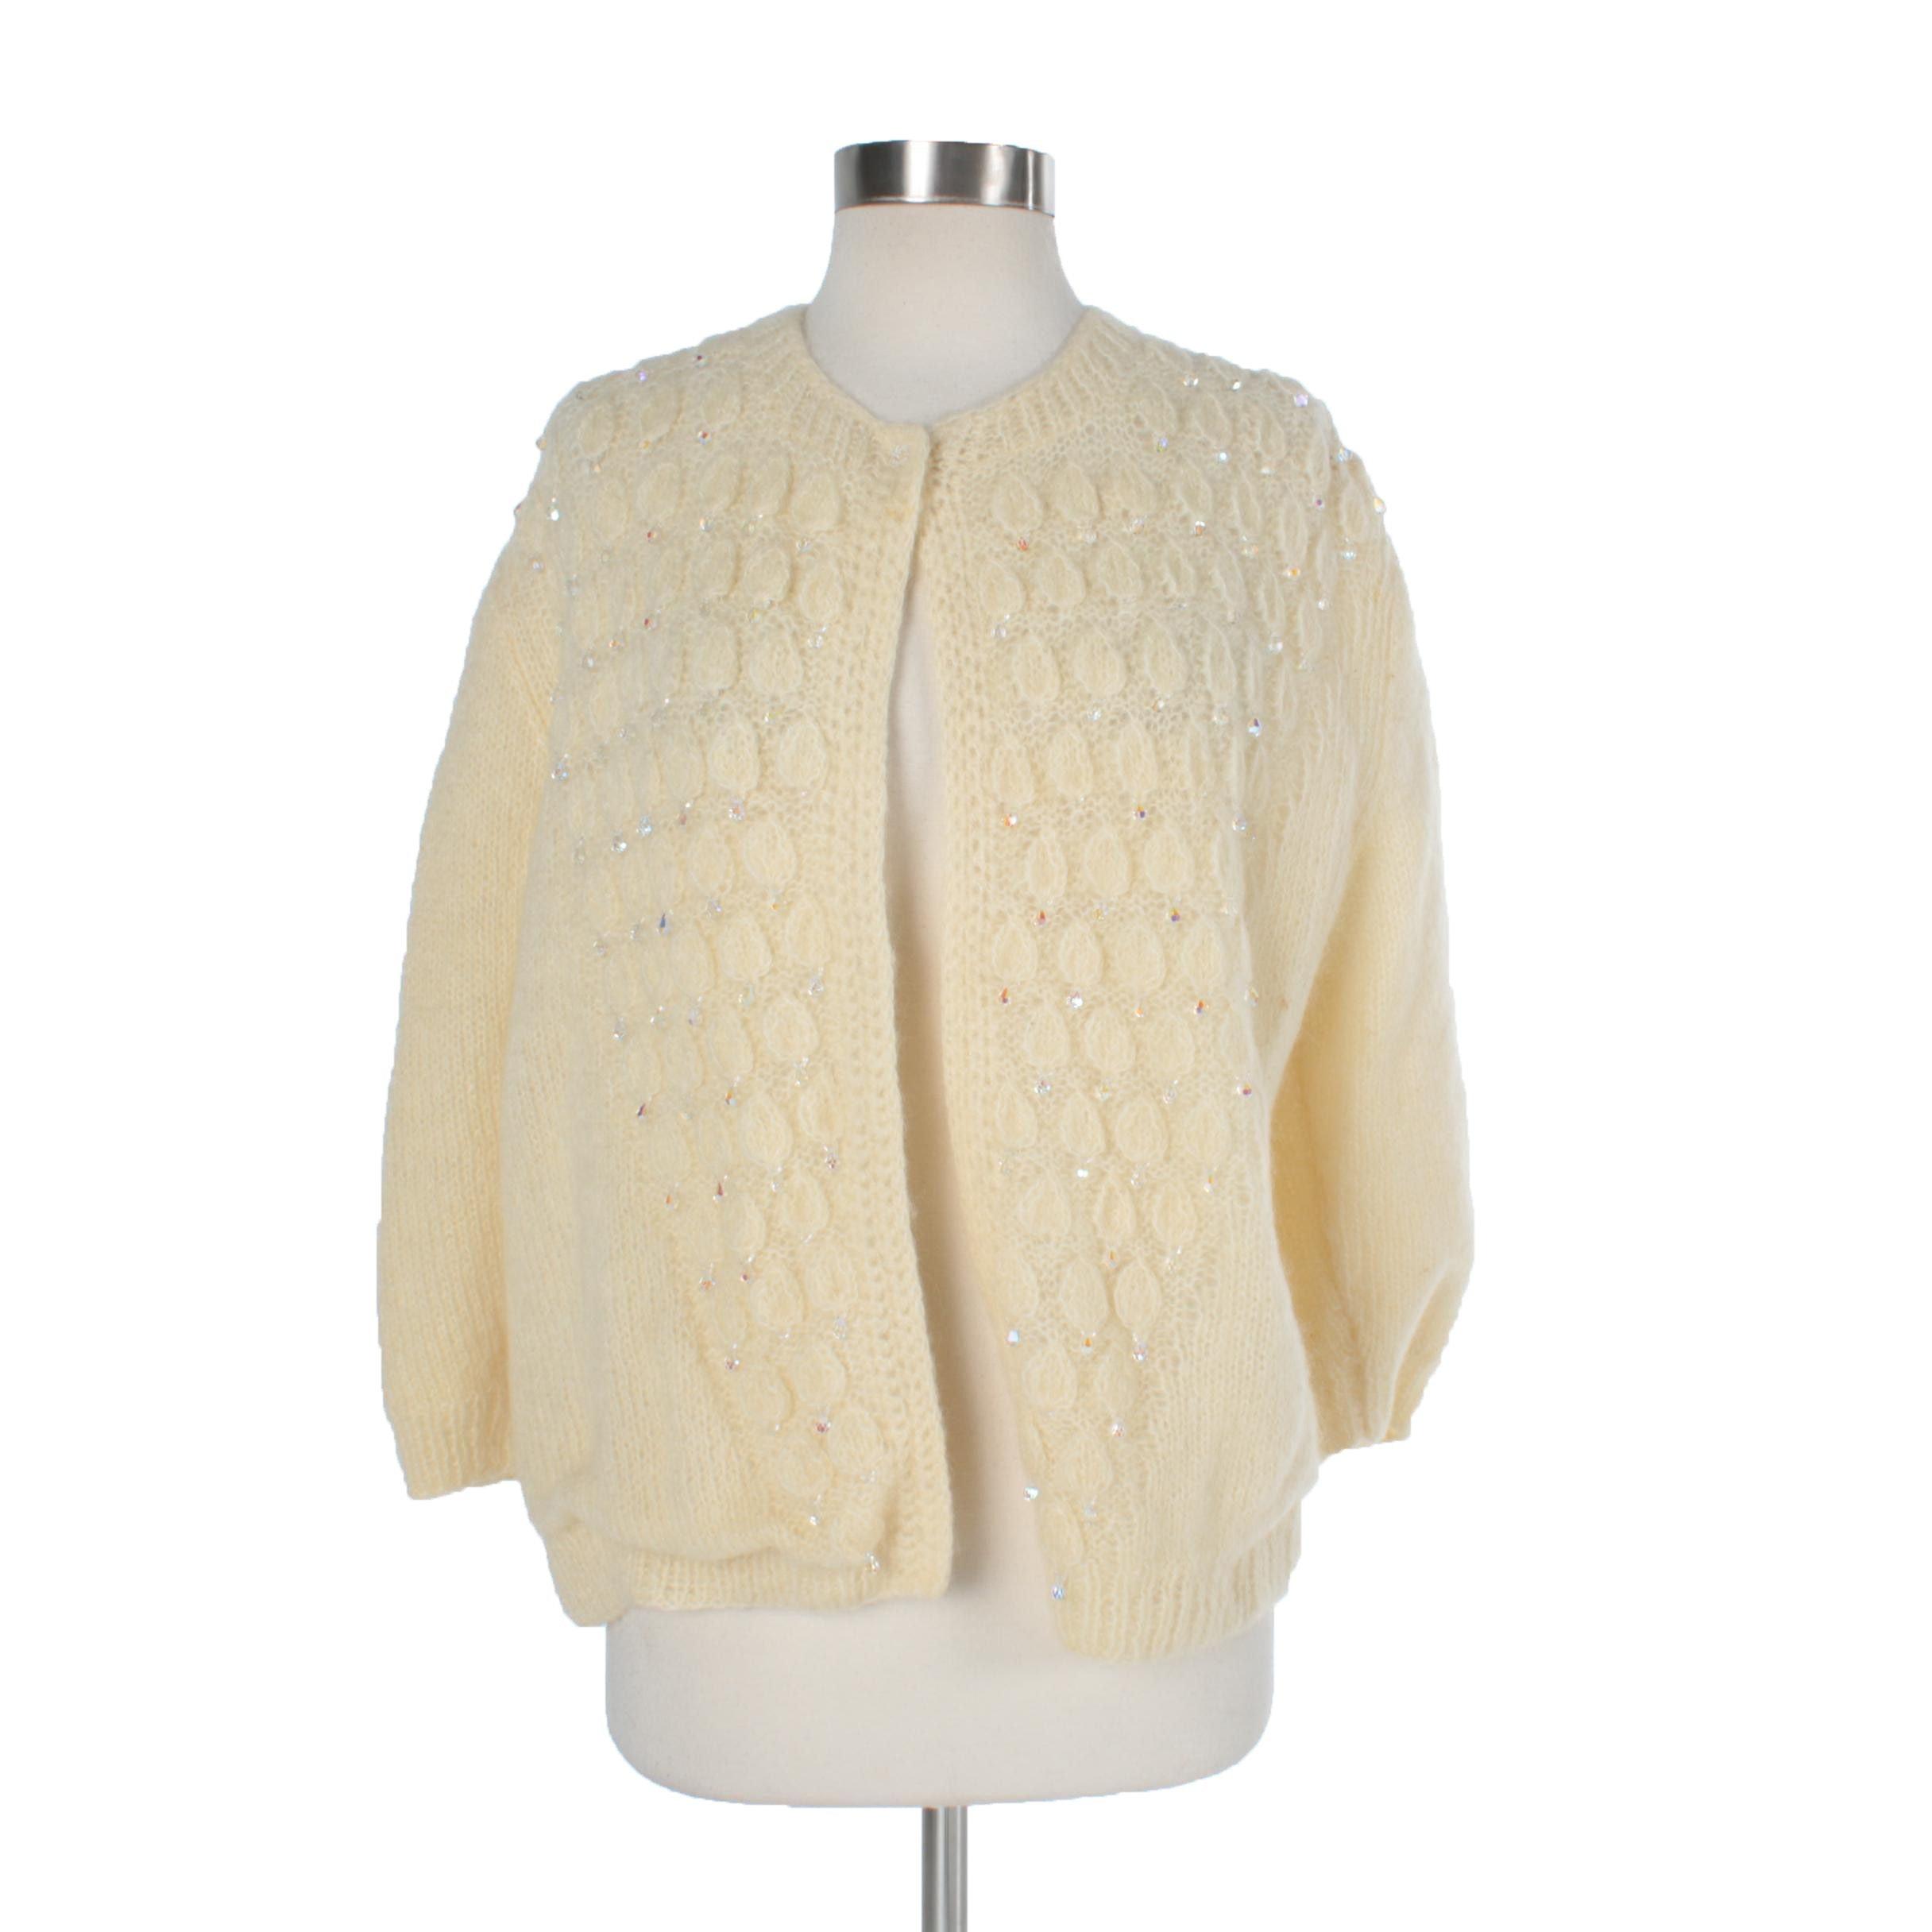 Women's Vintage Hand-Knit Cardigan